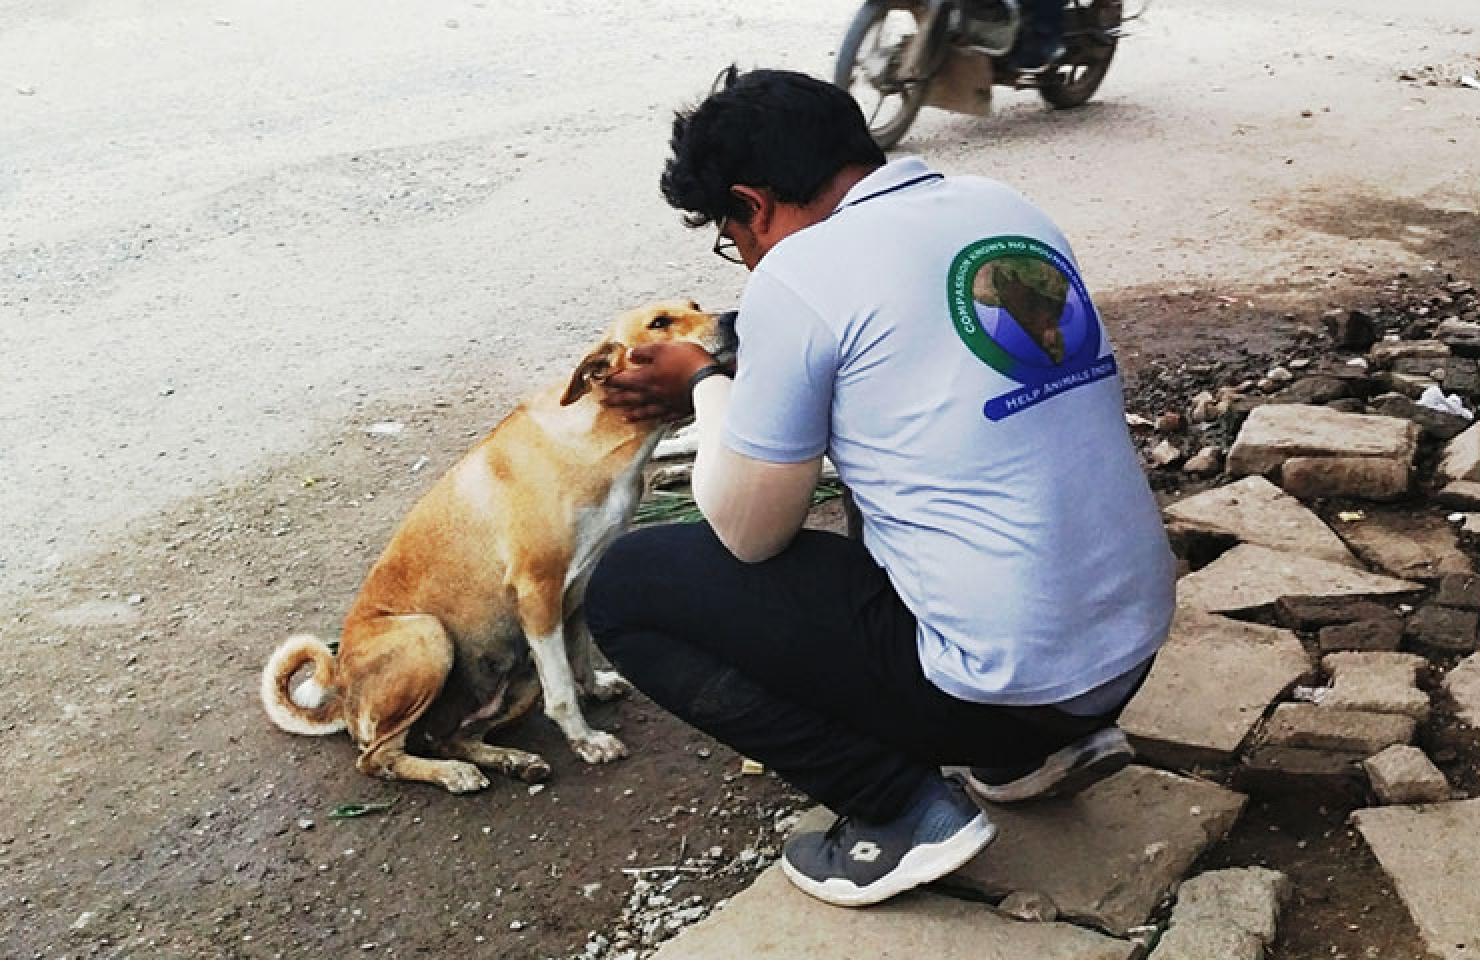 VfA member lovingly embraces a stray dog